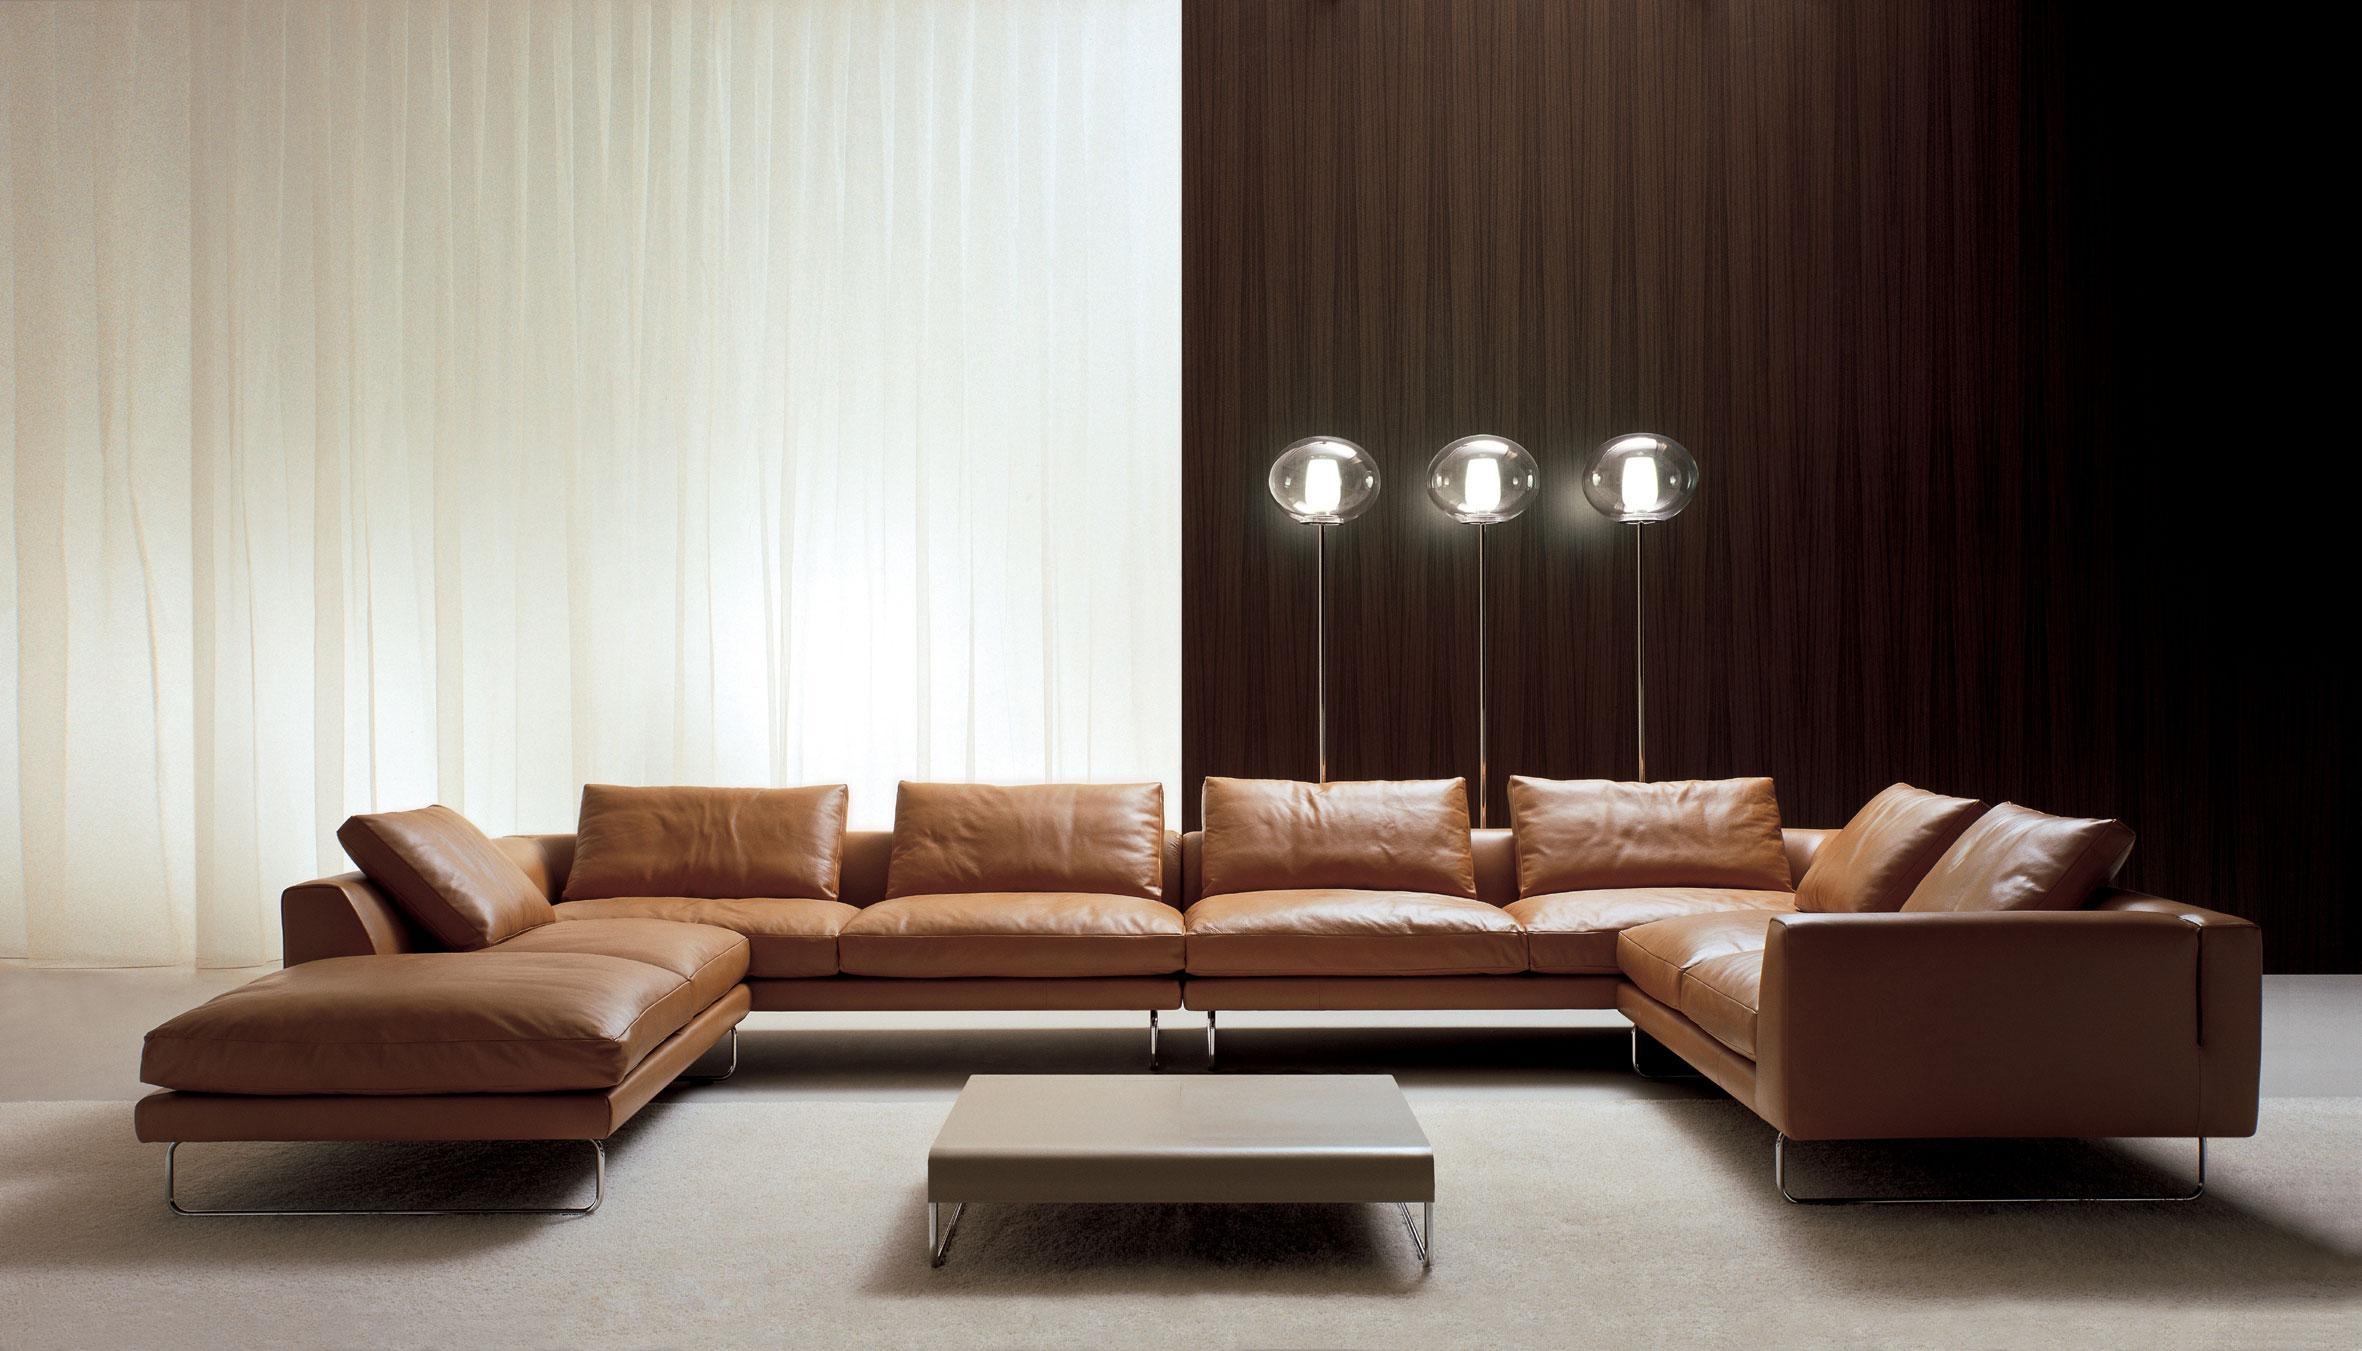 27 ~ Images Remarkable Italian Sofa Model Idea. Ambito (Image 1 of 20)